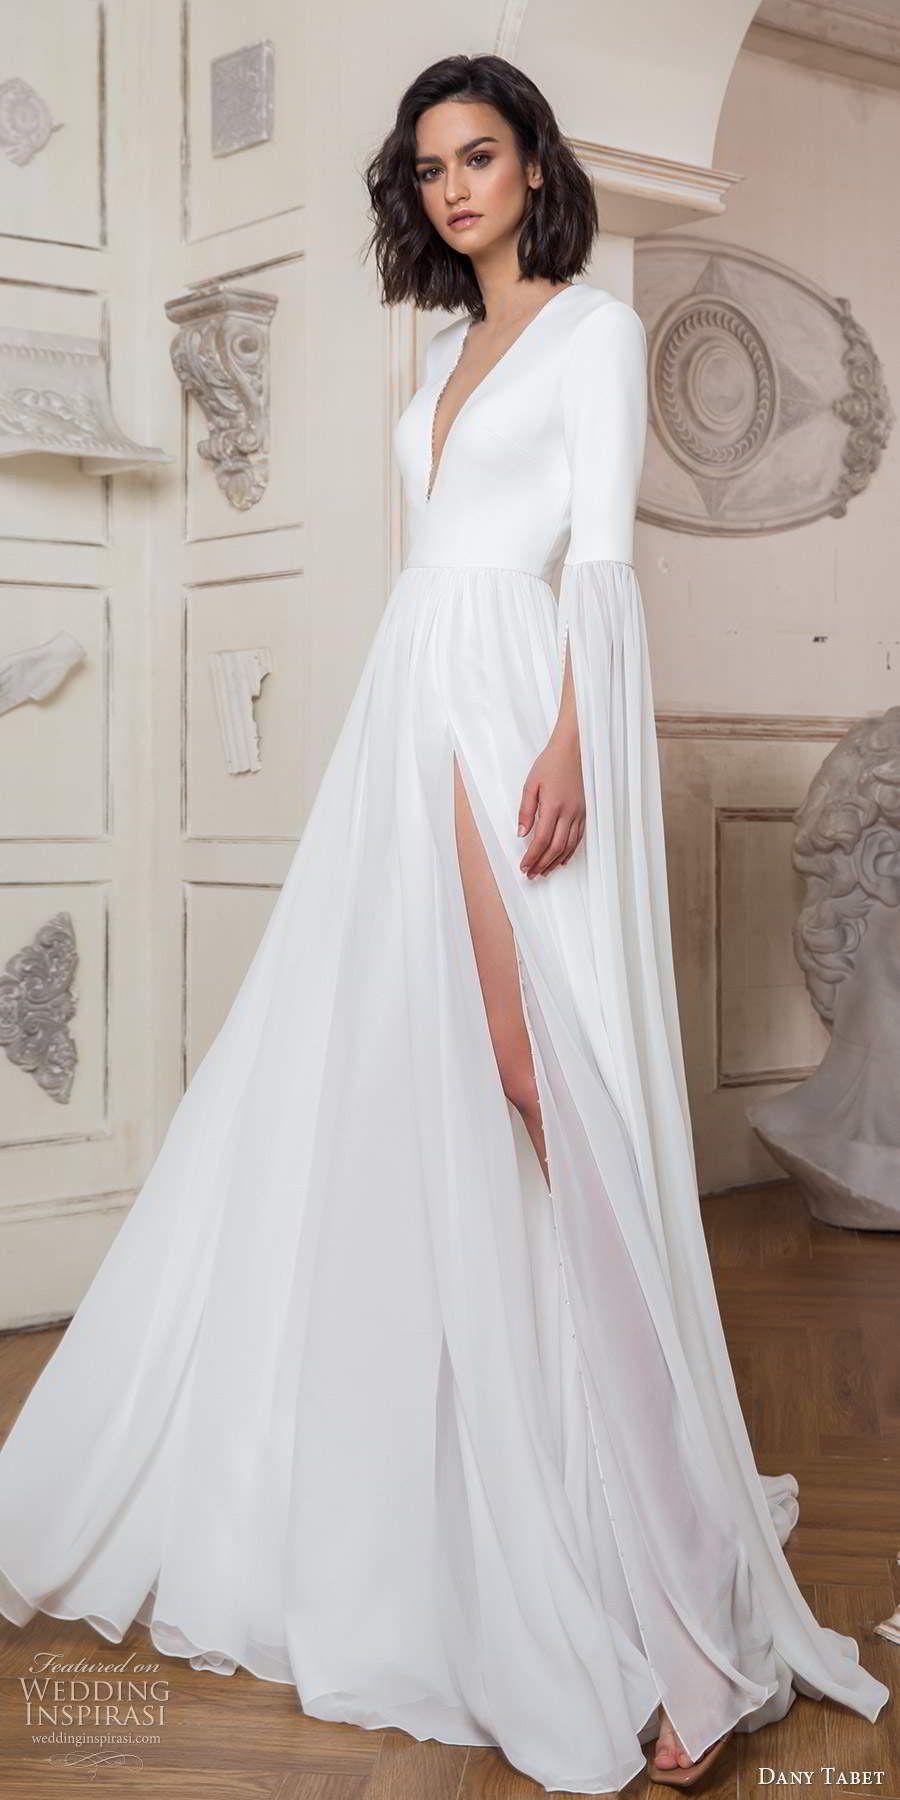 Dany Tabet Spring 2020 Wedding Dresses Goddess Bridal Collection Wedding Inspirasi Long Sleeve Satin Wedding Dress Chiffon Wedding Gowns Lace Wedding Dress With Sleeves [ 1800 x 900 Pixel ]